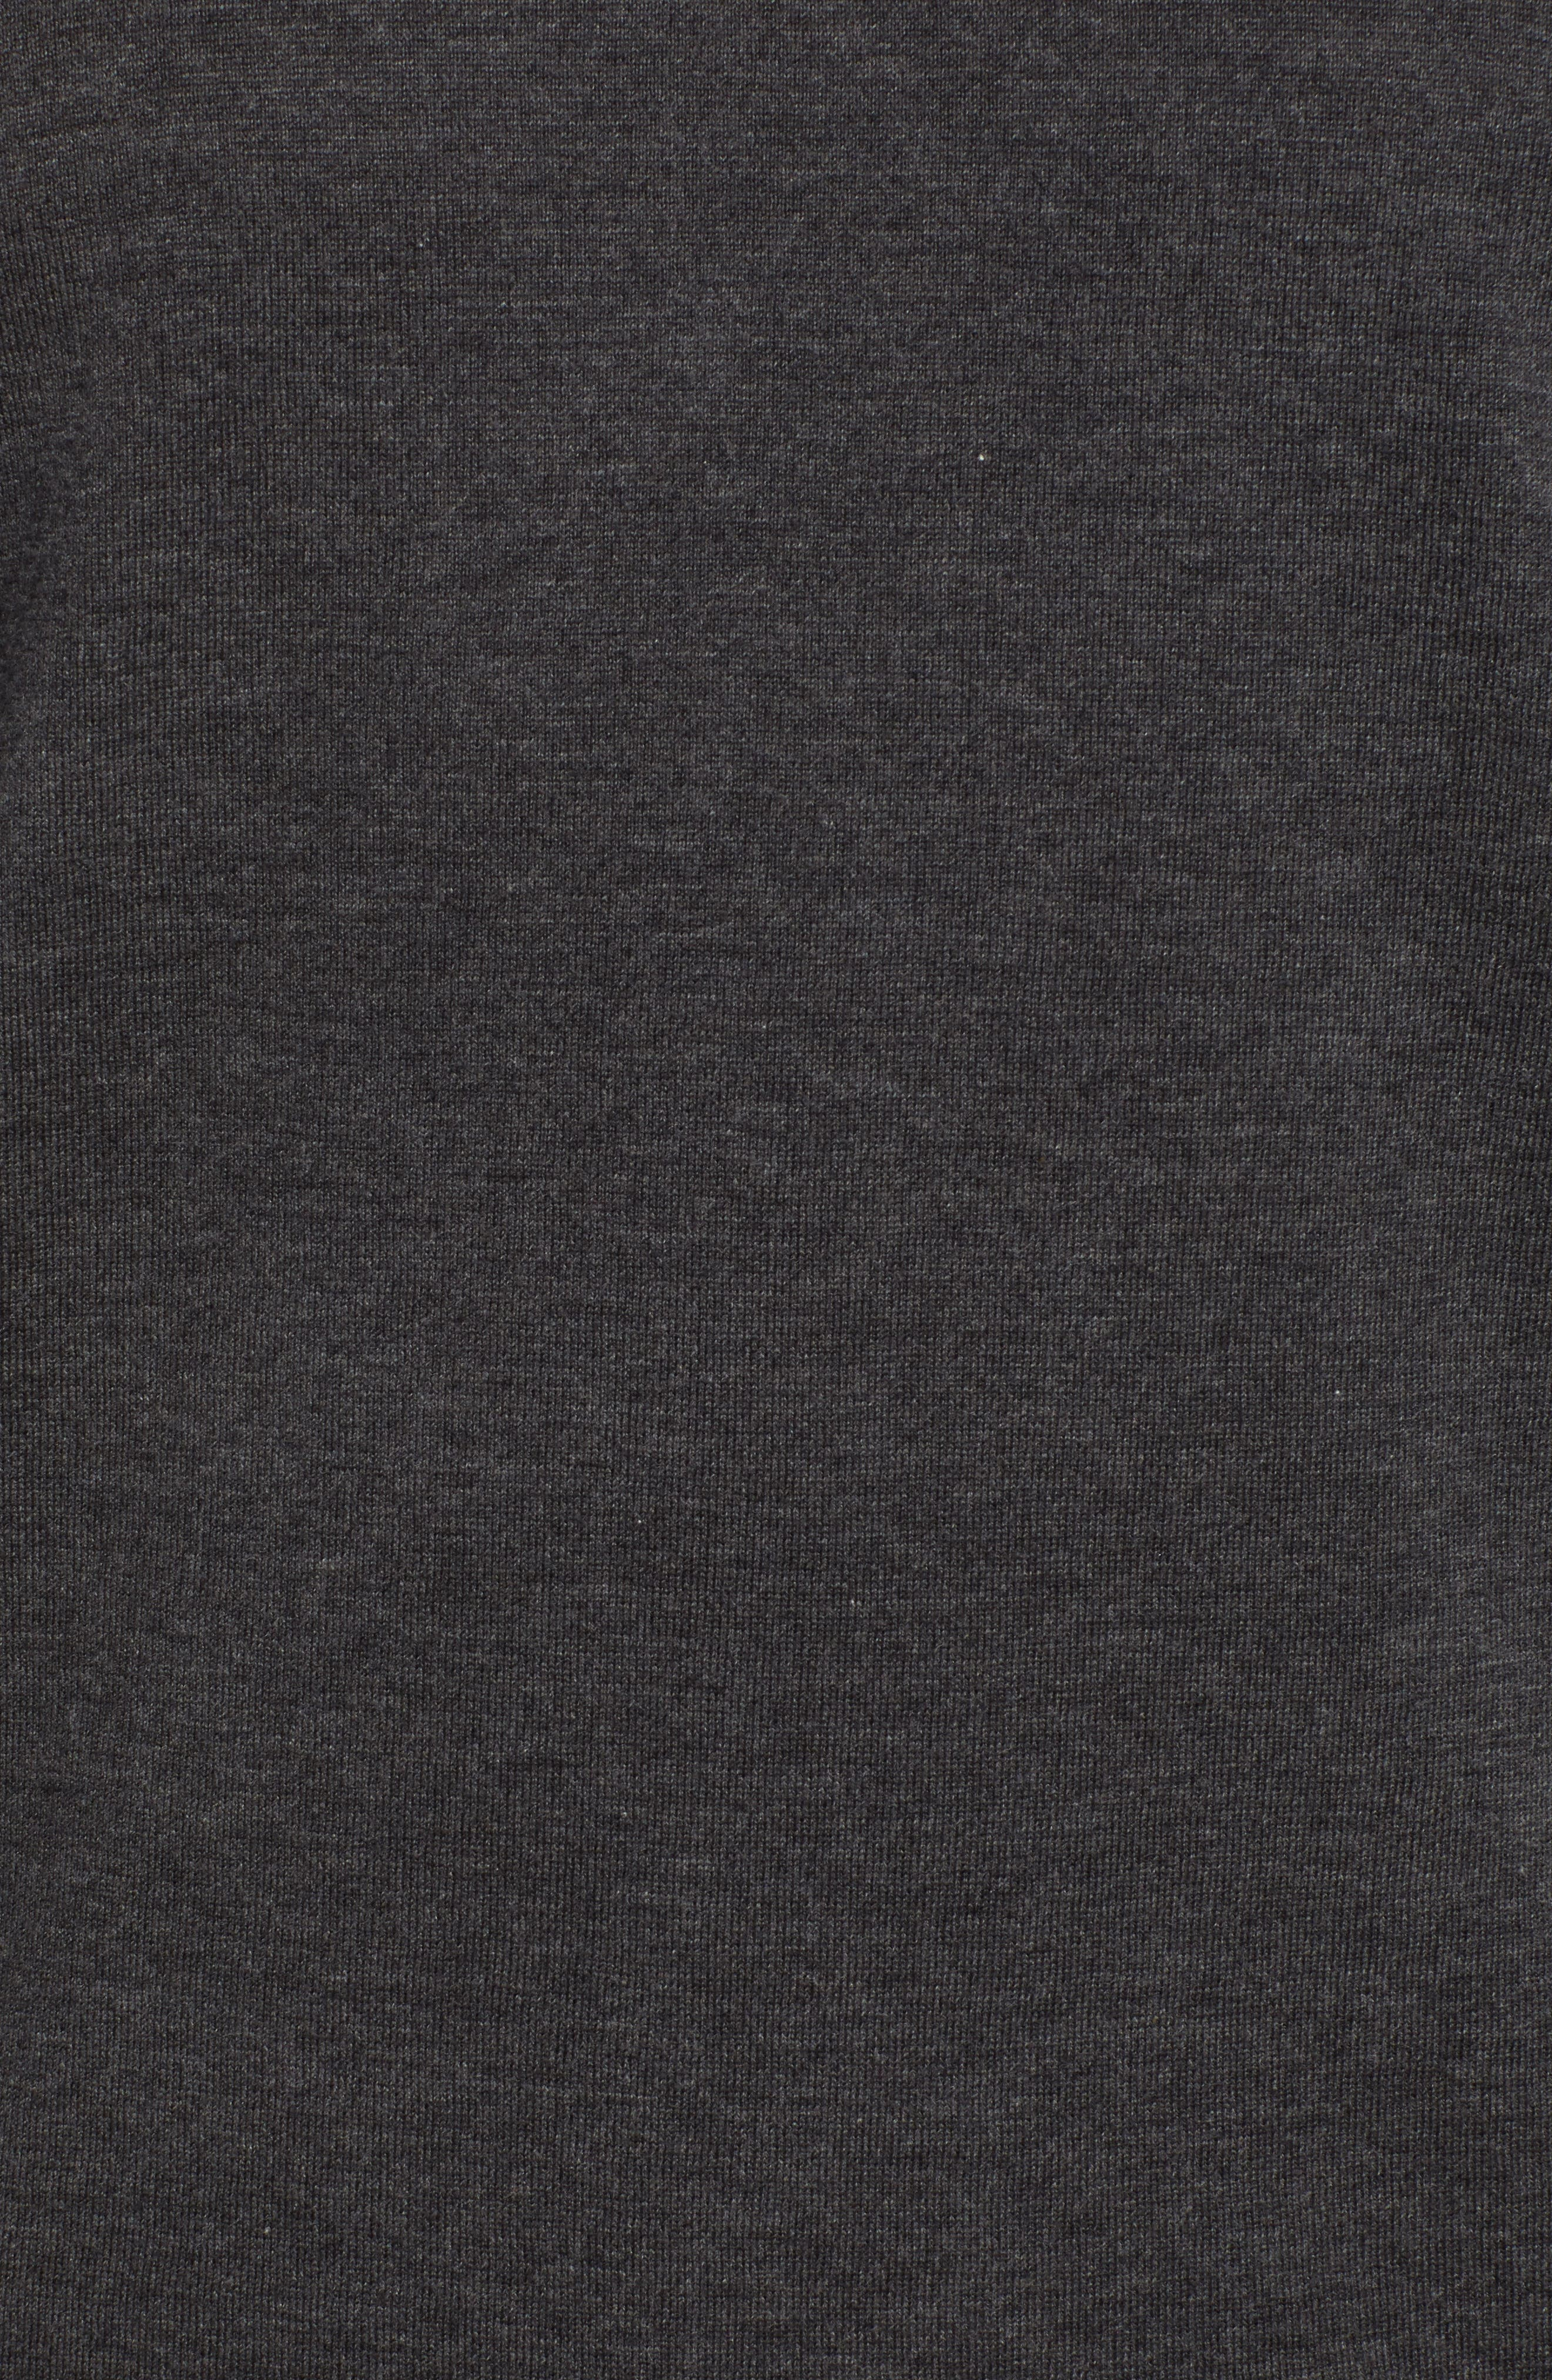 Fine Gauge Regular Fit Cotton Polo,                             Alternate thumbnail 5, color,                             HEATHER CHARCOAL